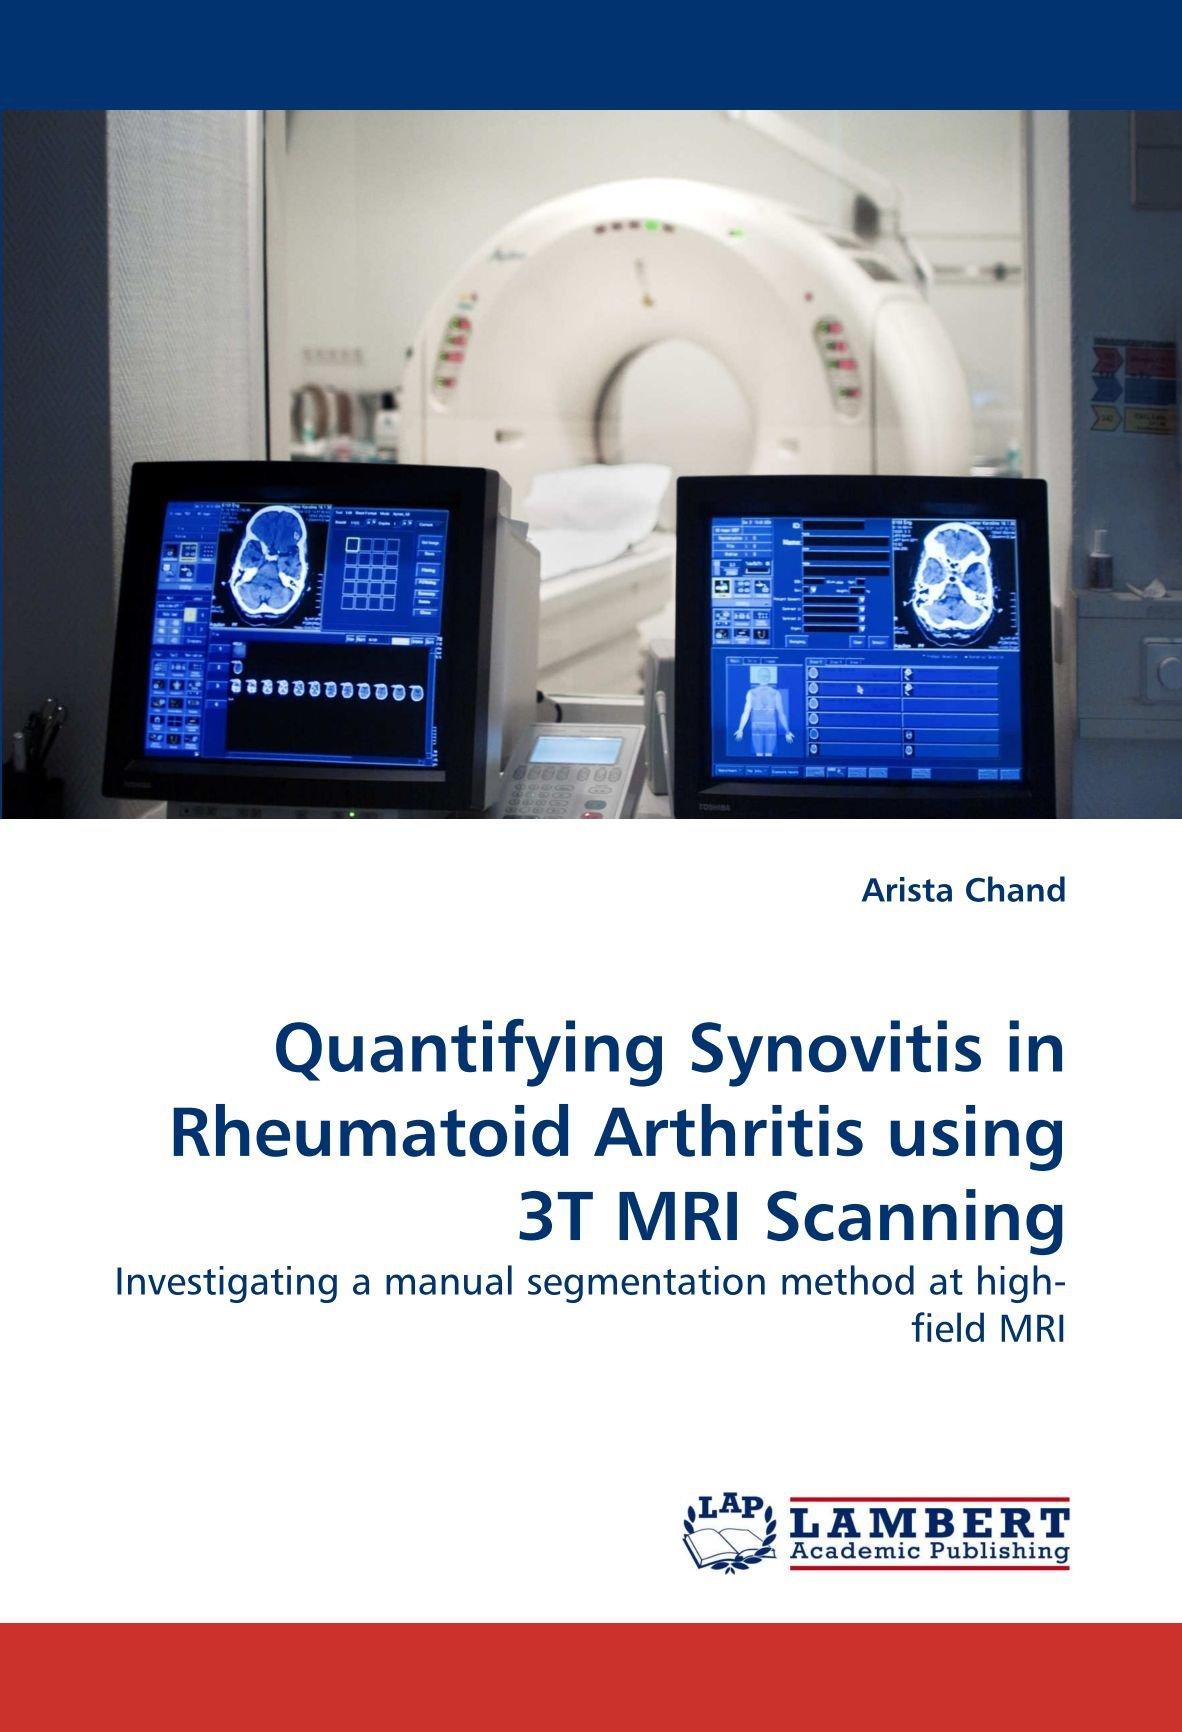 Download Quantifying Synovitis in Rheumatoid Arthritis using 3T MRI Scanning: Investigating a manual segmentation method at high-field MRI ebook